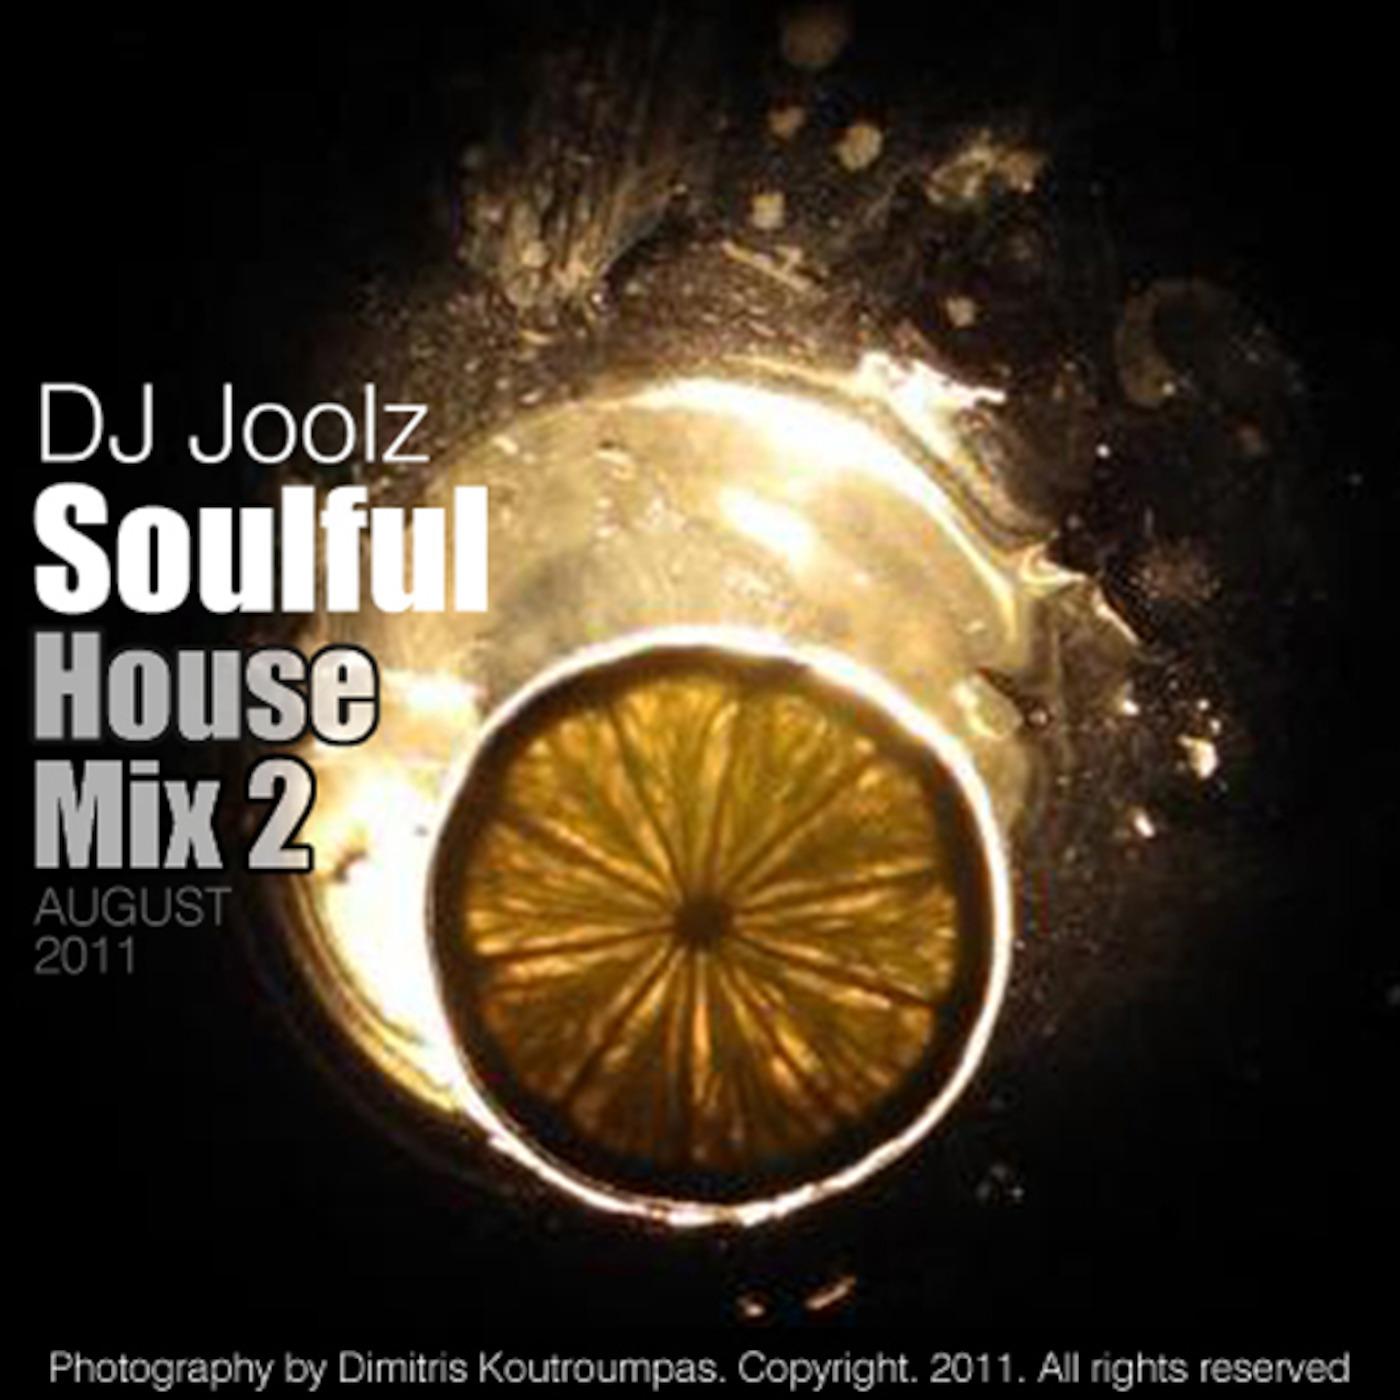 DJ Joolz - Soulful, Deep & Jackin House | Listen Free on